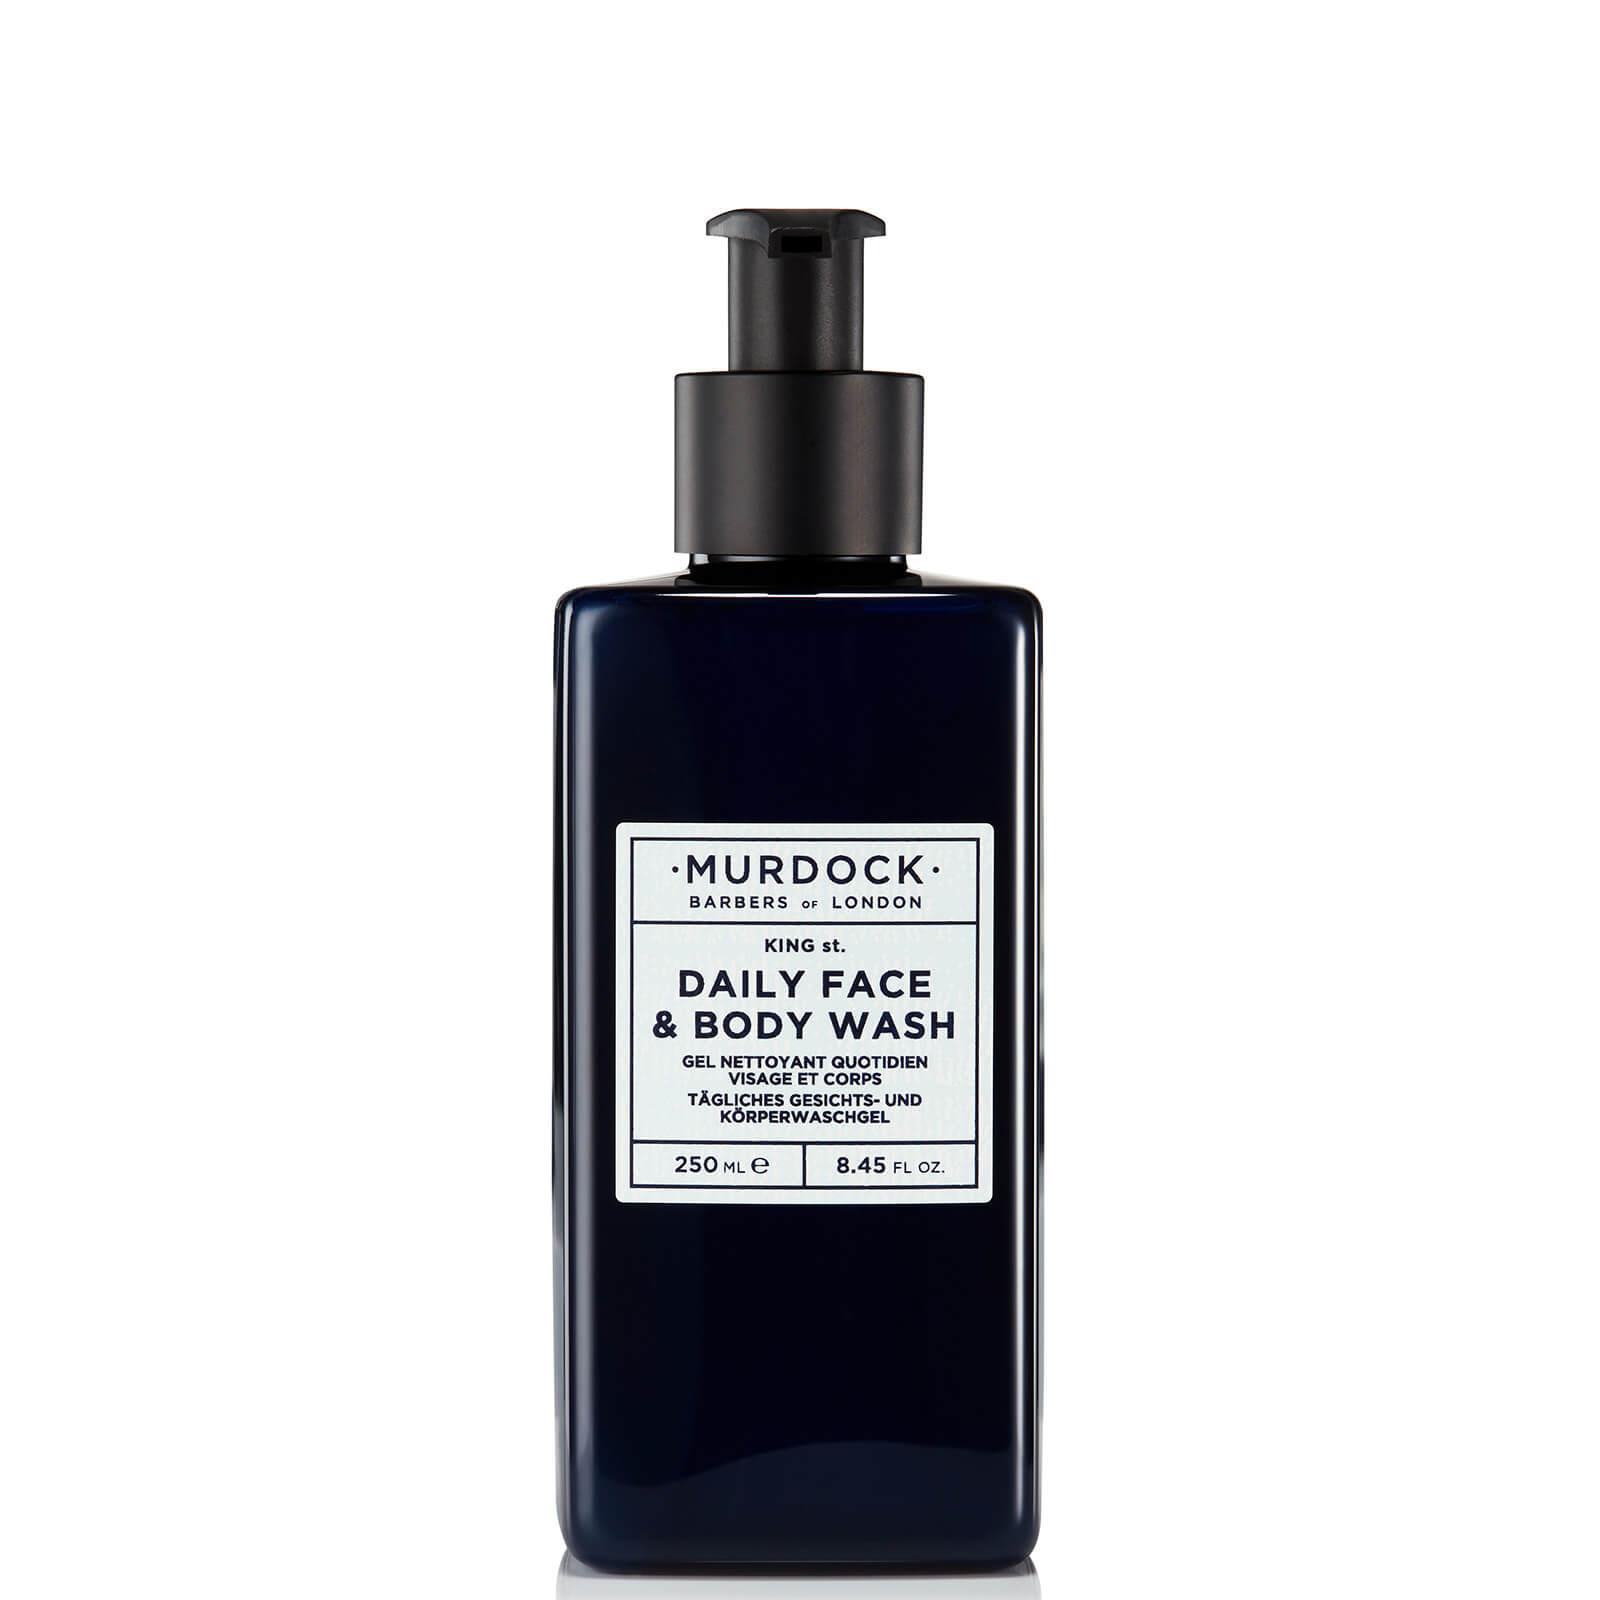 Купить Murdock London Daily Face and Body Wash 250ml